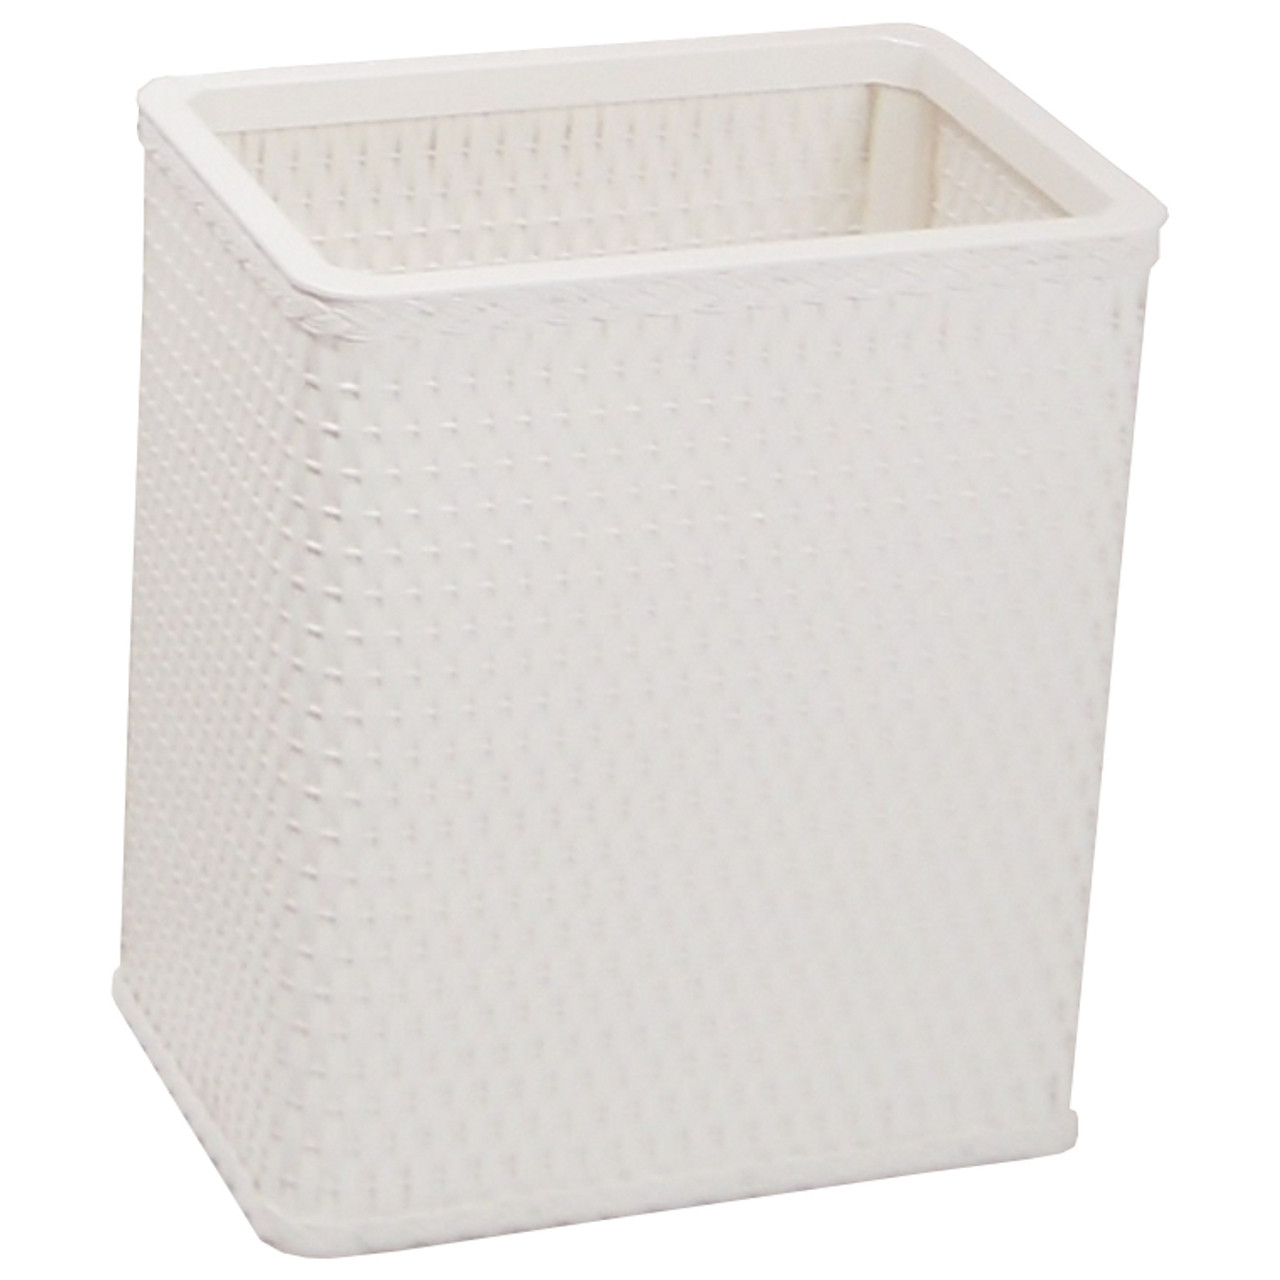 Chelsea Wicker Rectangular Wastebasket White